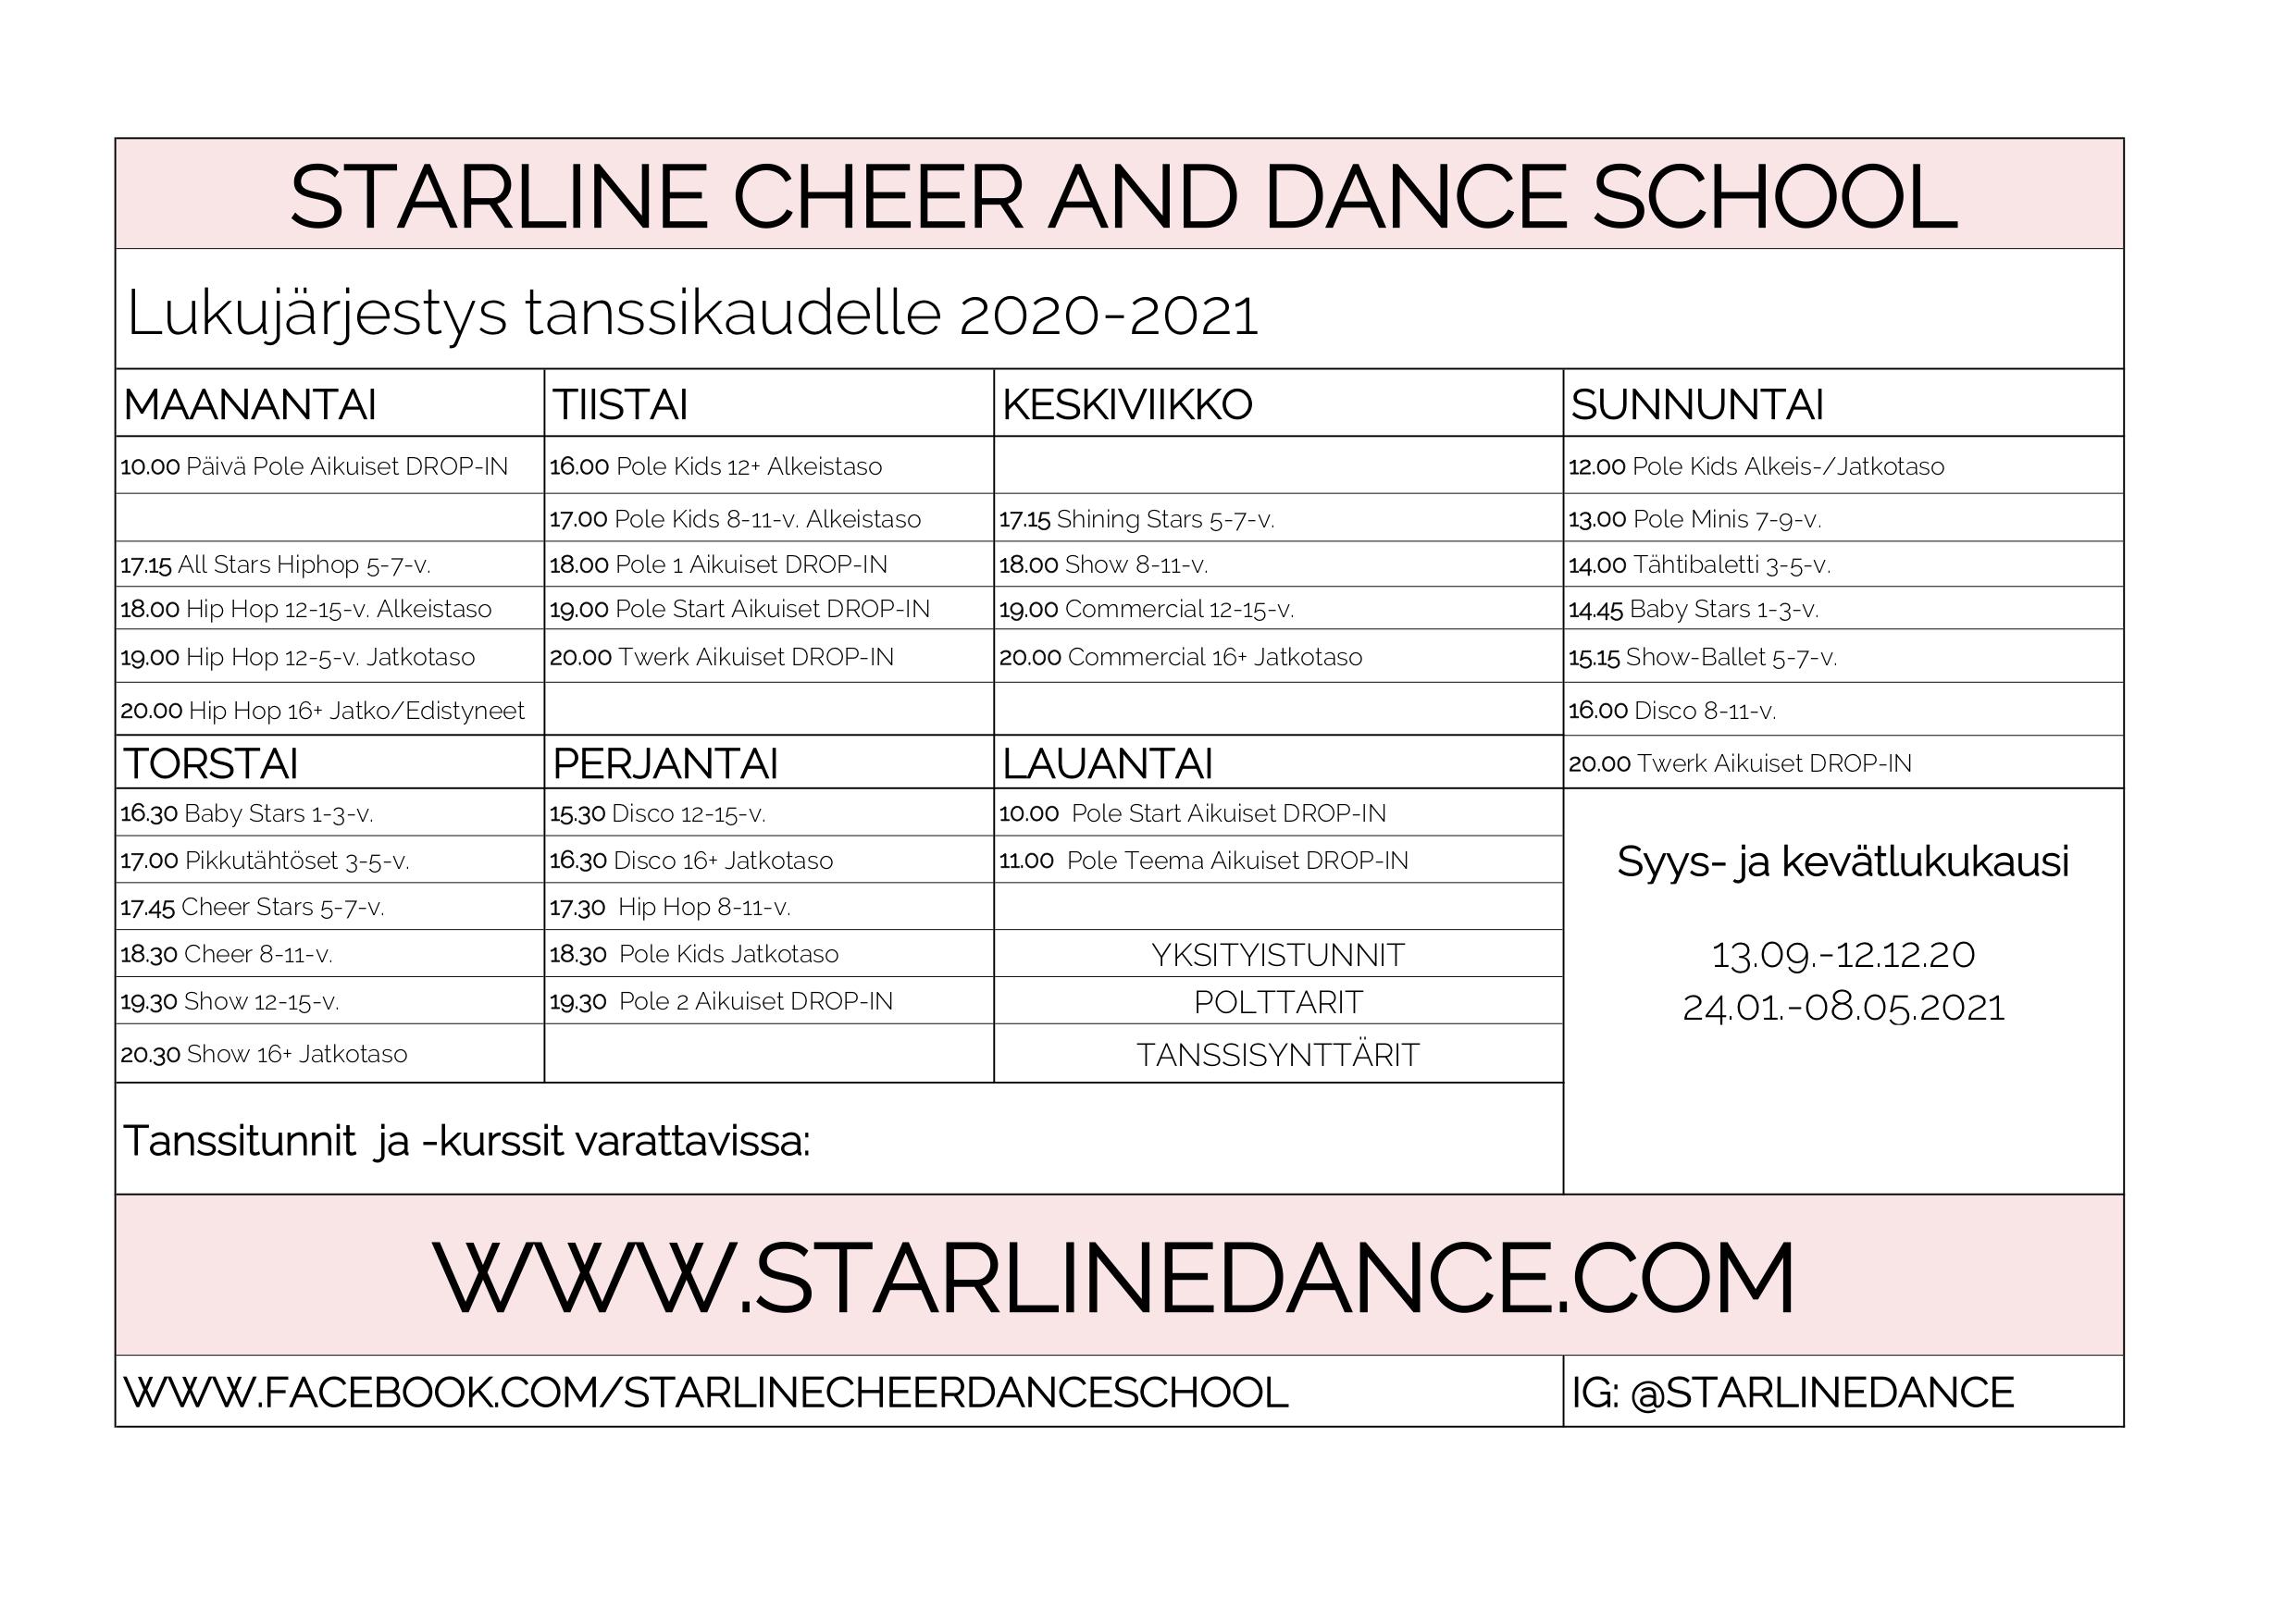 Lukujärjestys_Starline2021